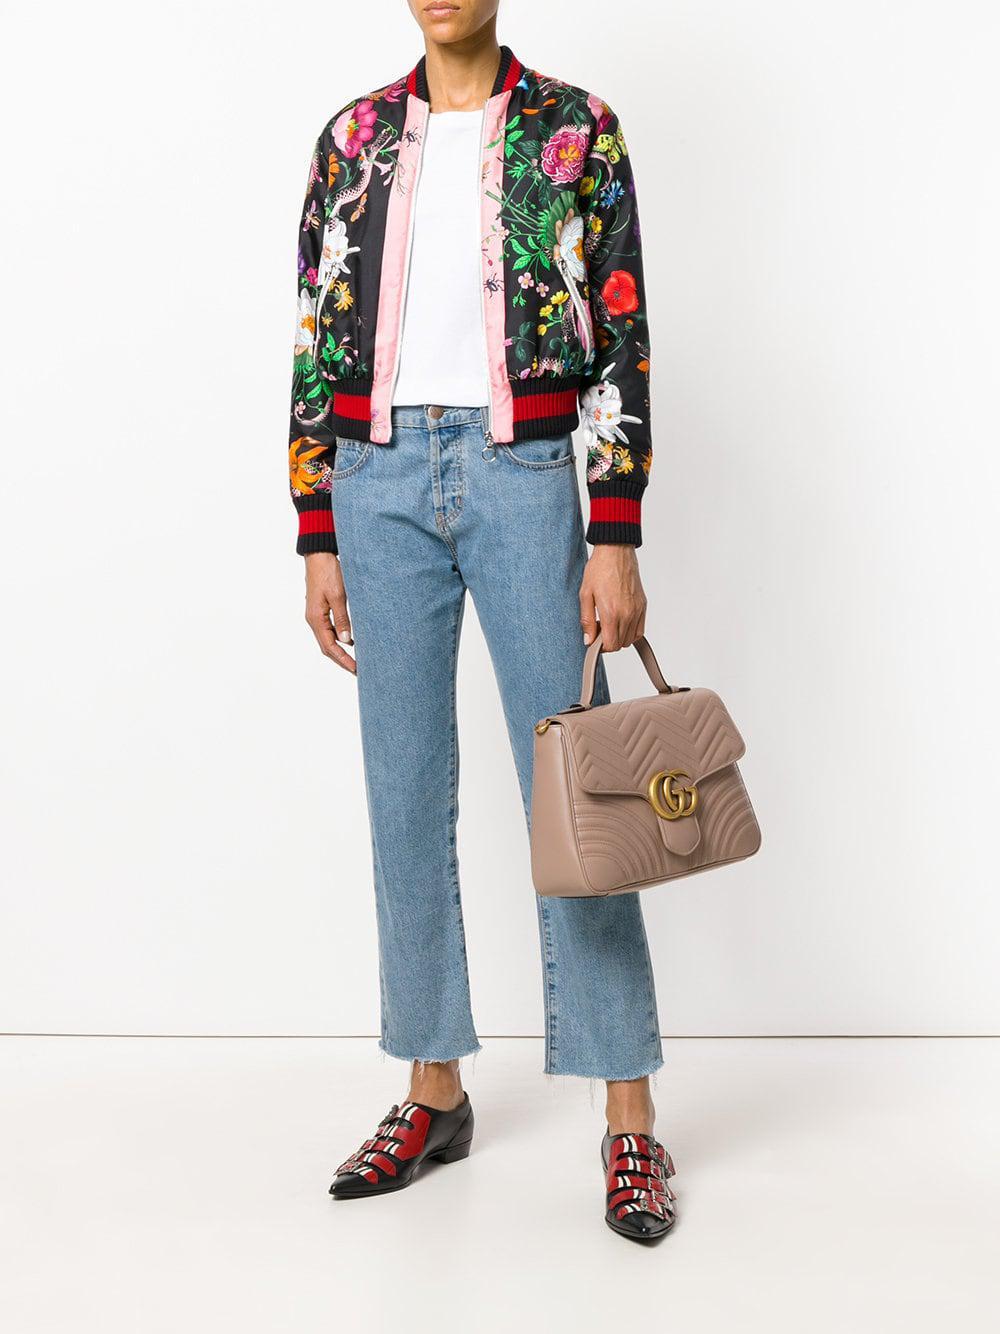 dd5f31f99a4a Gucci GG Marmont Medium Top Handle Bag in Brown - Lyst